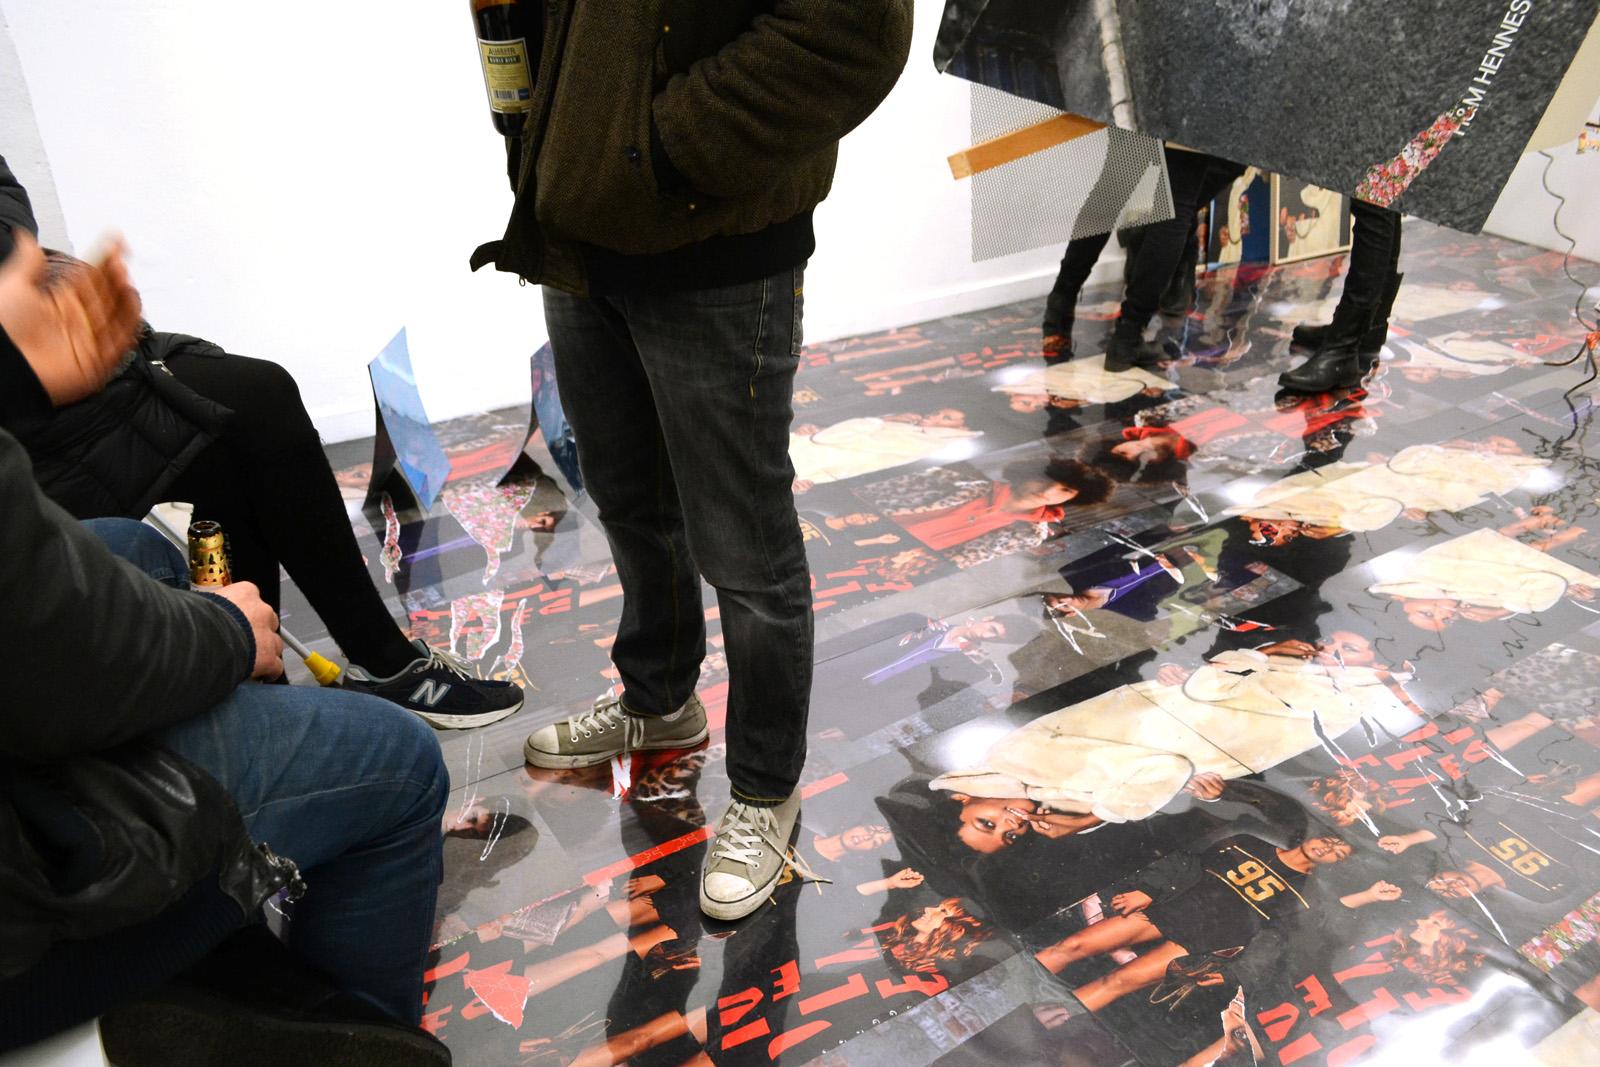 Yotaro Niwa Images #2 stay hungry Berlin